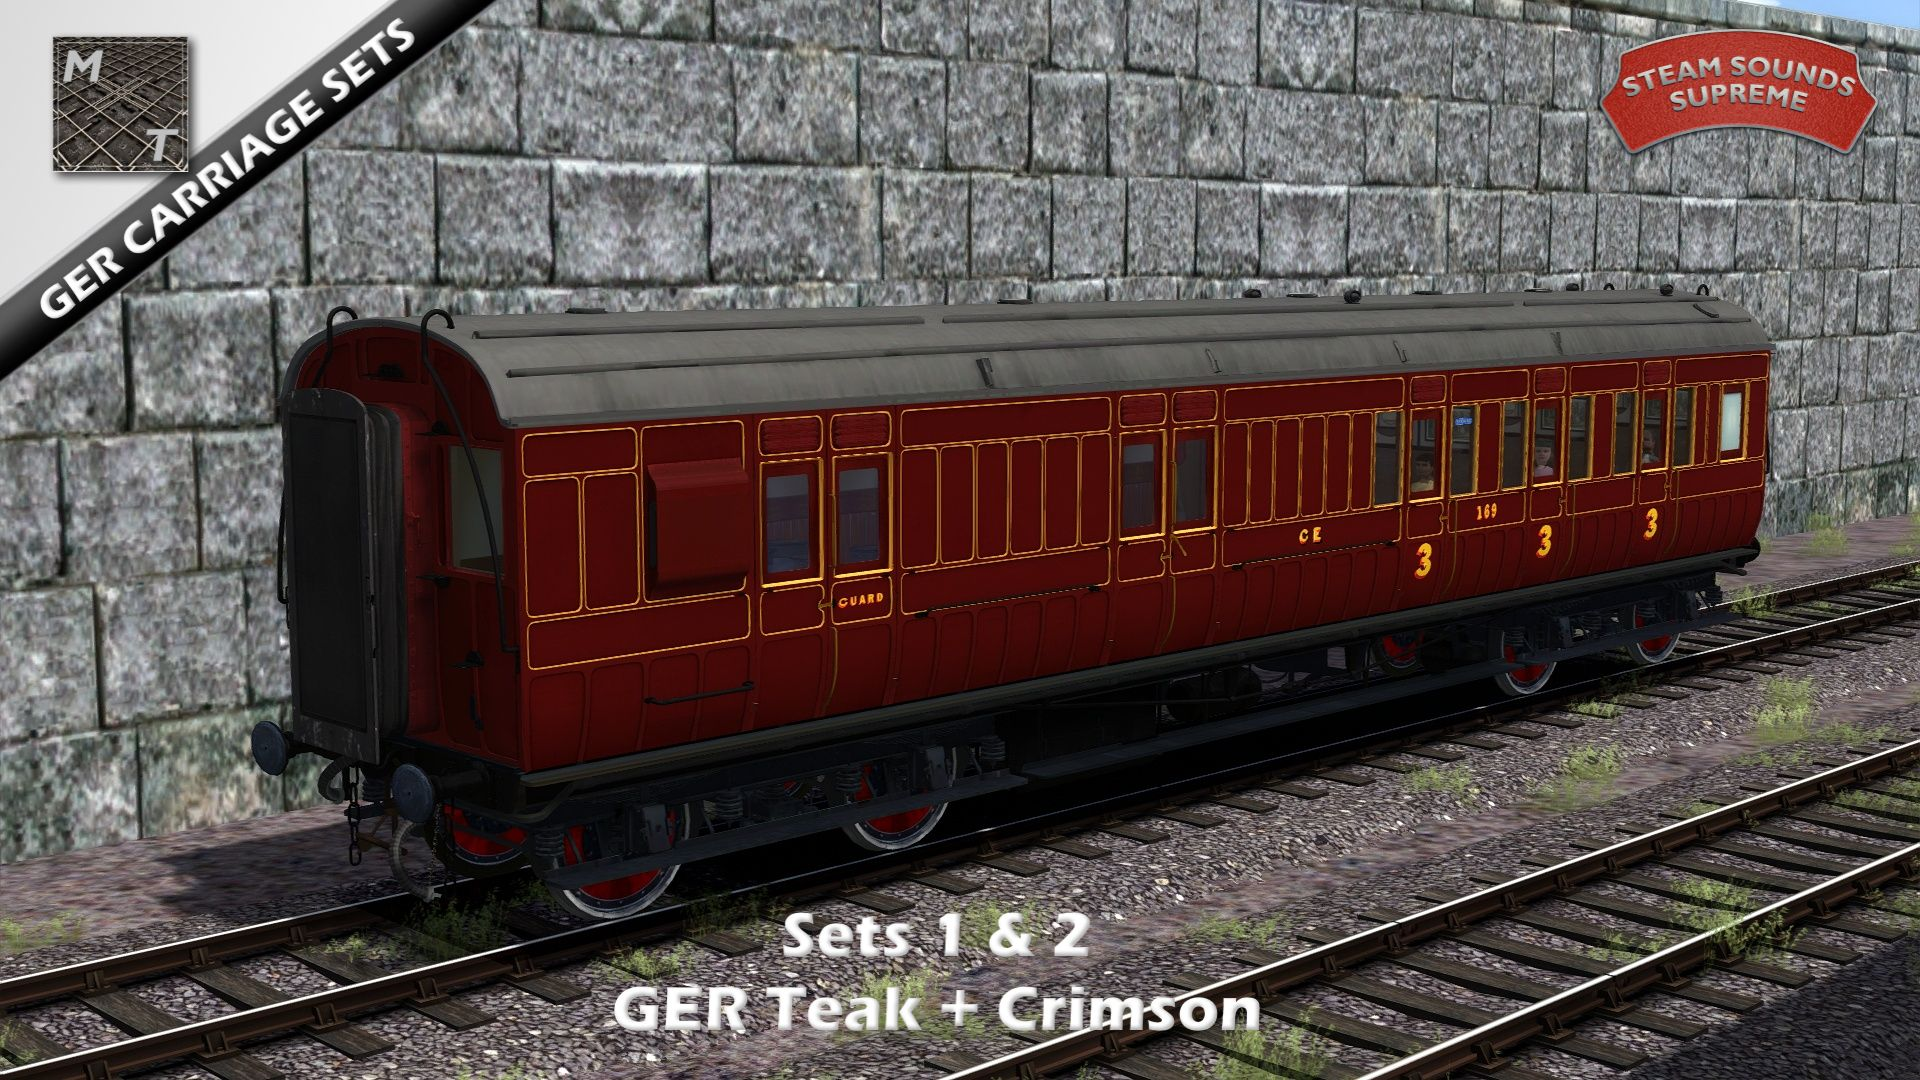 GERCorrSet1-2_16.jpg